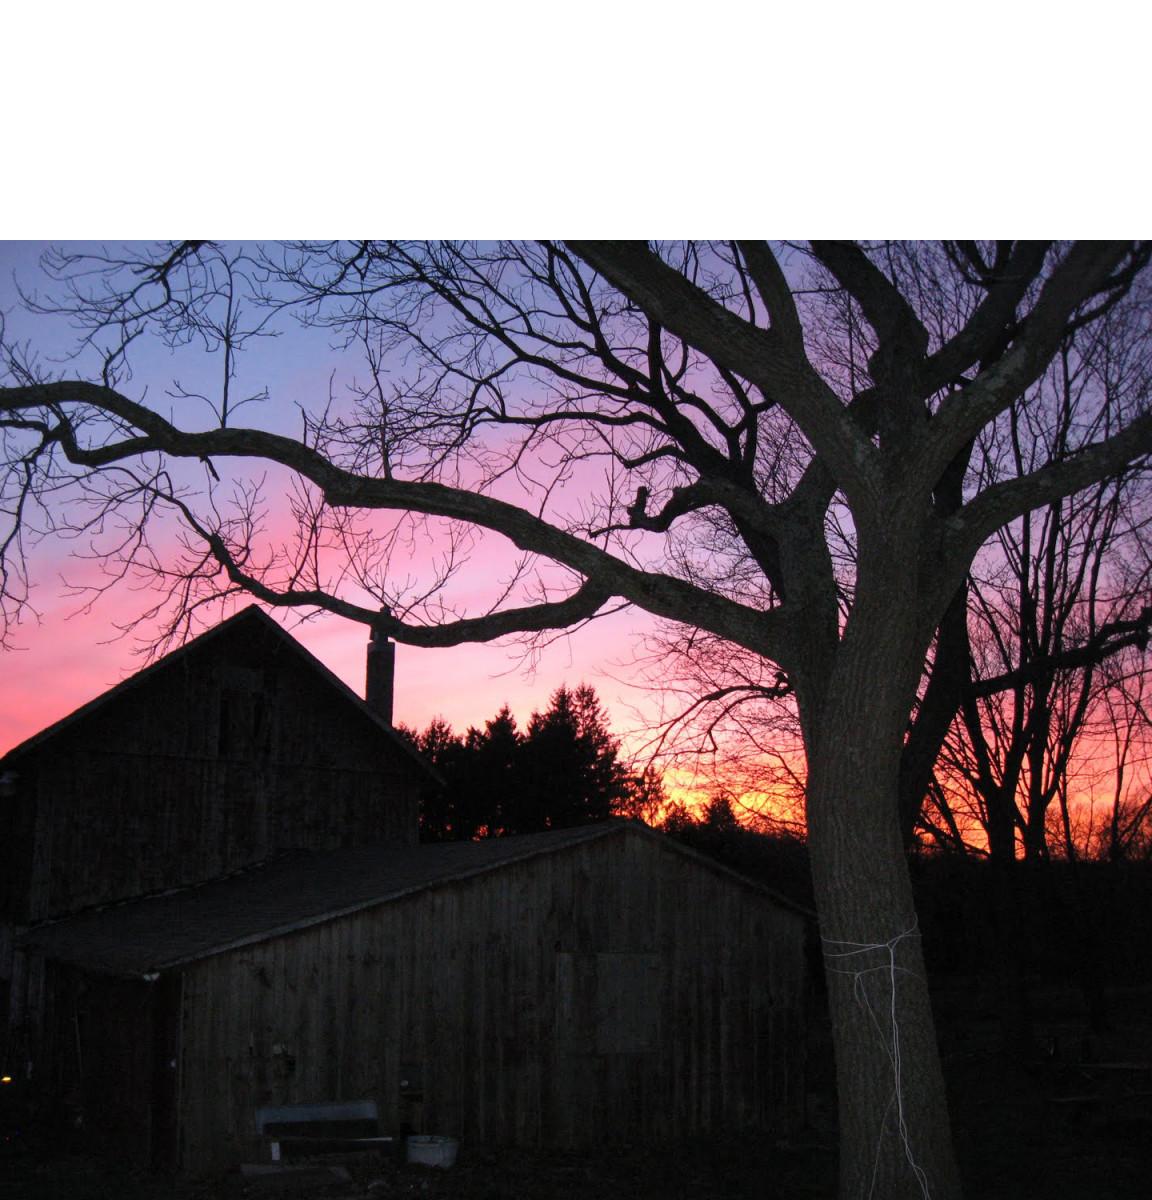 The scary old barn, from arrowacresfarm.blogspot.com